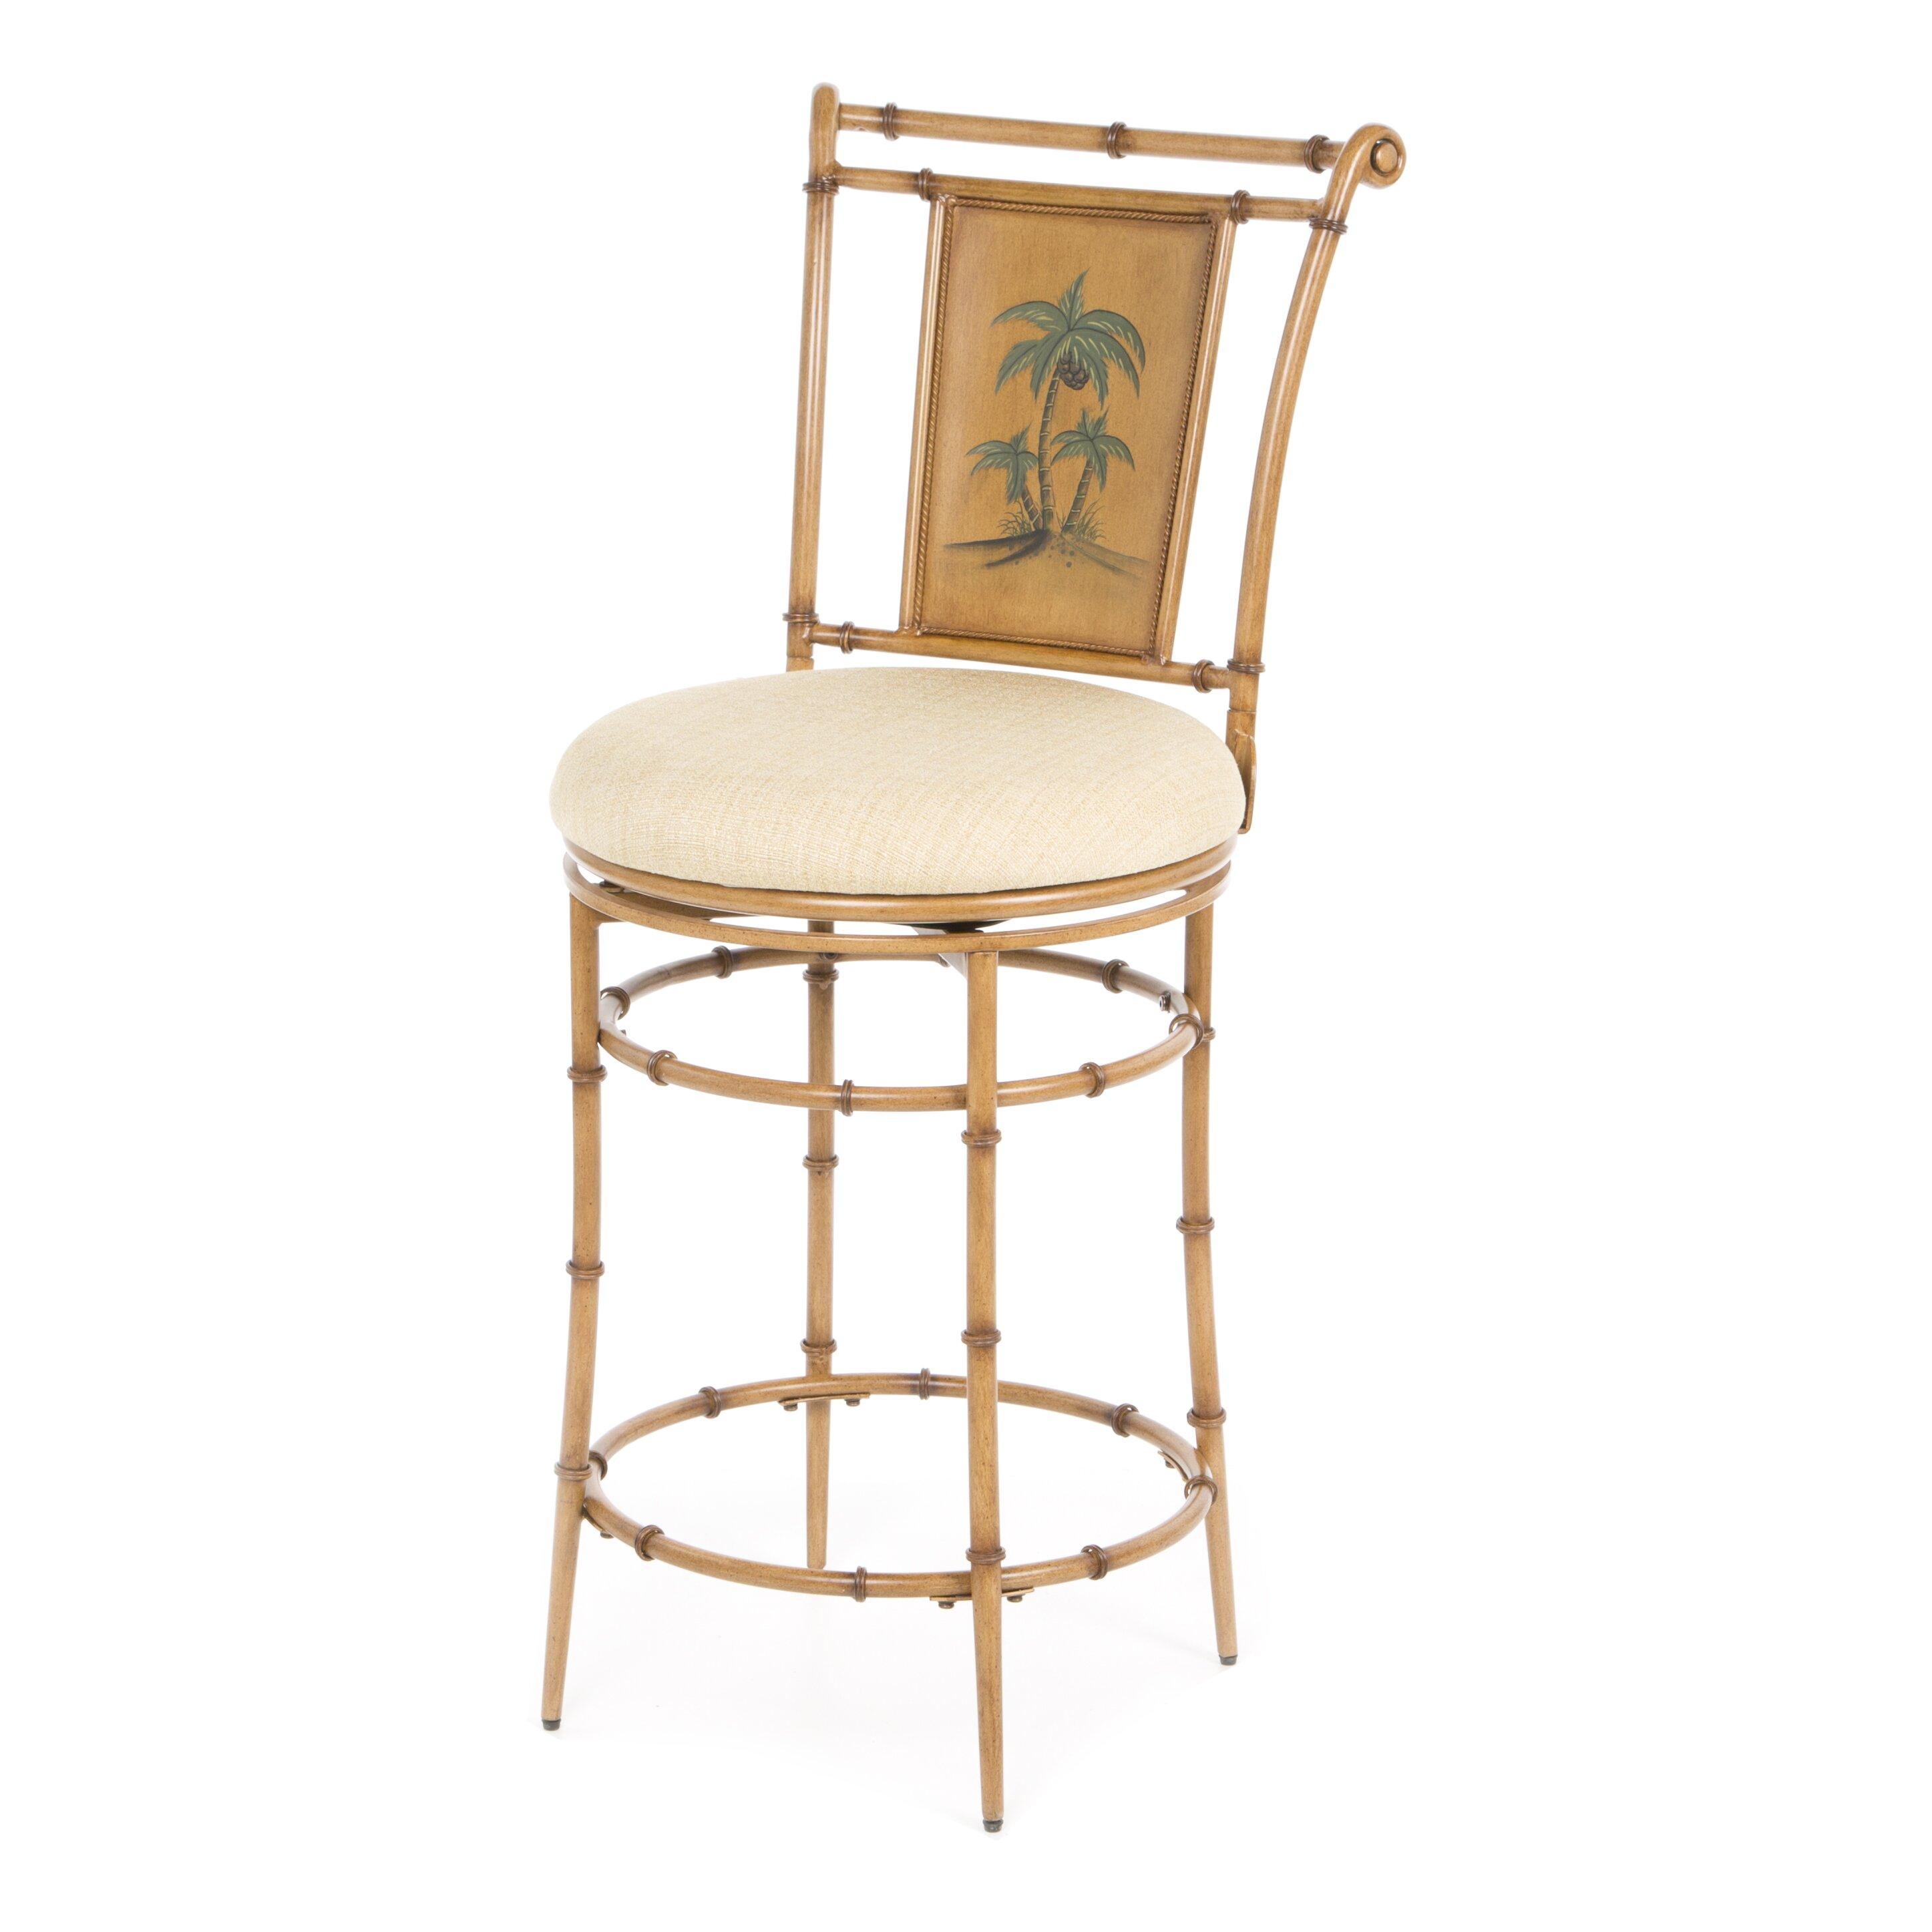 Bay isle home luna 26quot swivel bar stool reviews wayfairca for Tropical home bar furniture